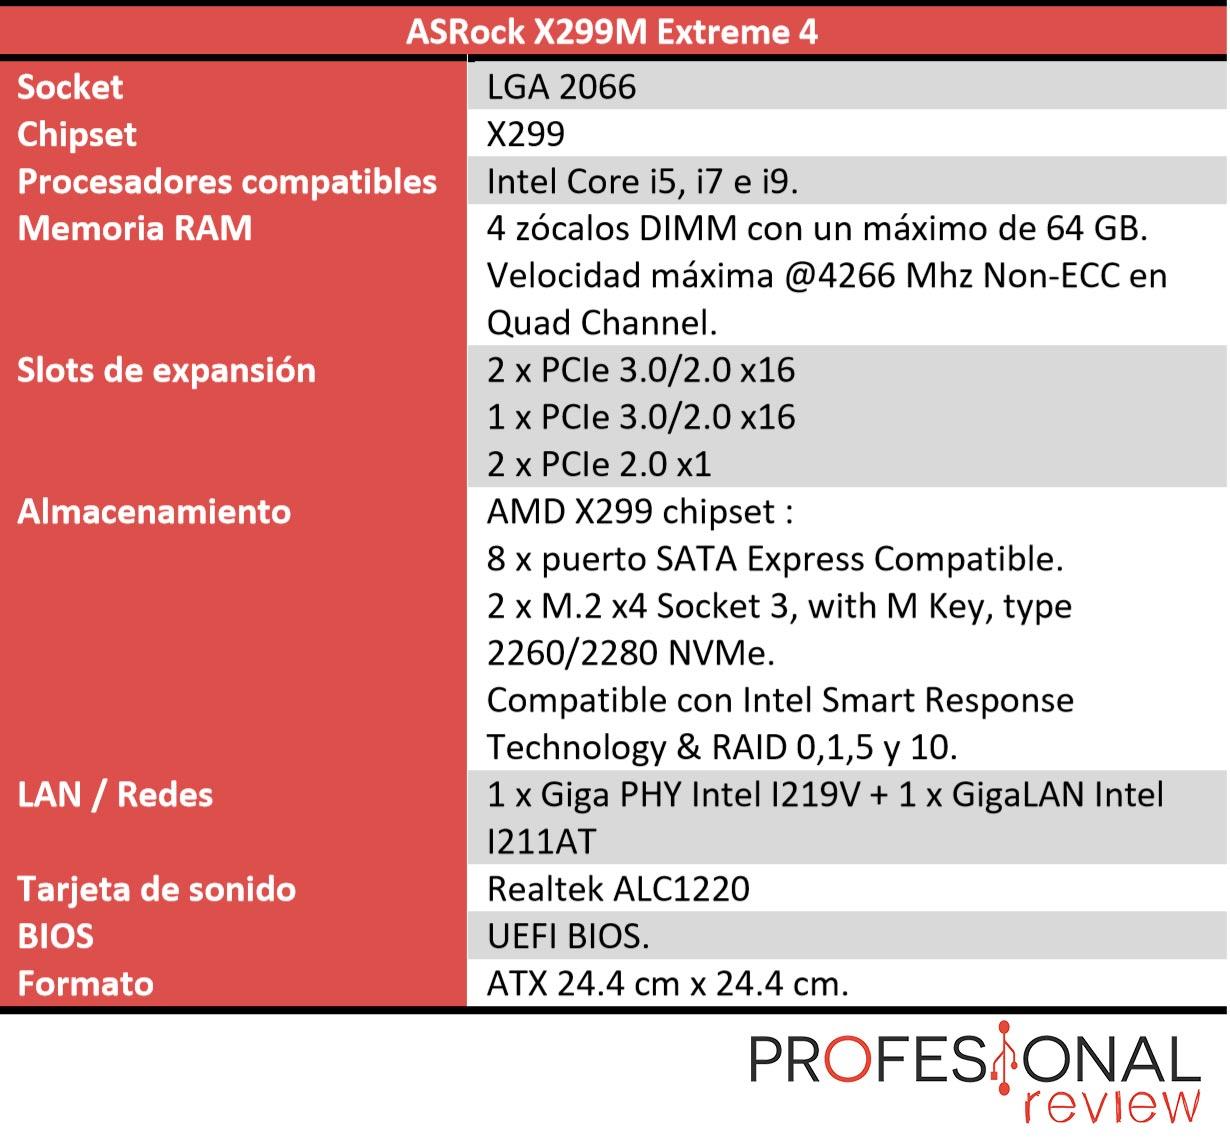 ASRock X299M Extreme 4 caracteristicas